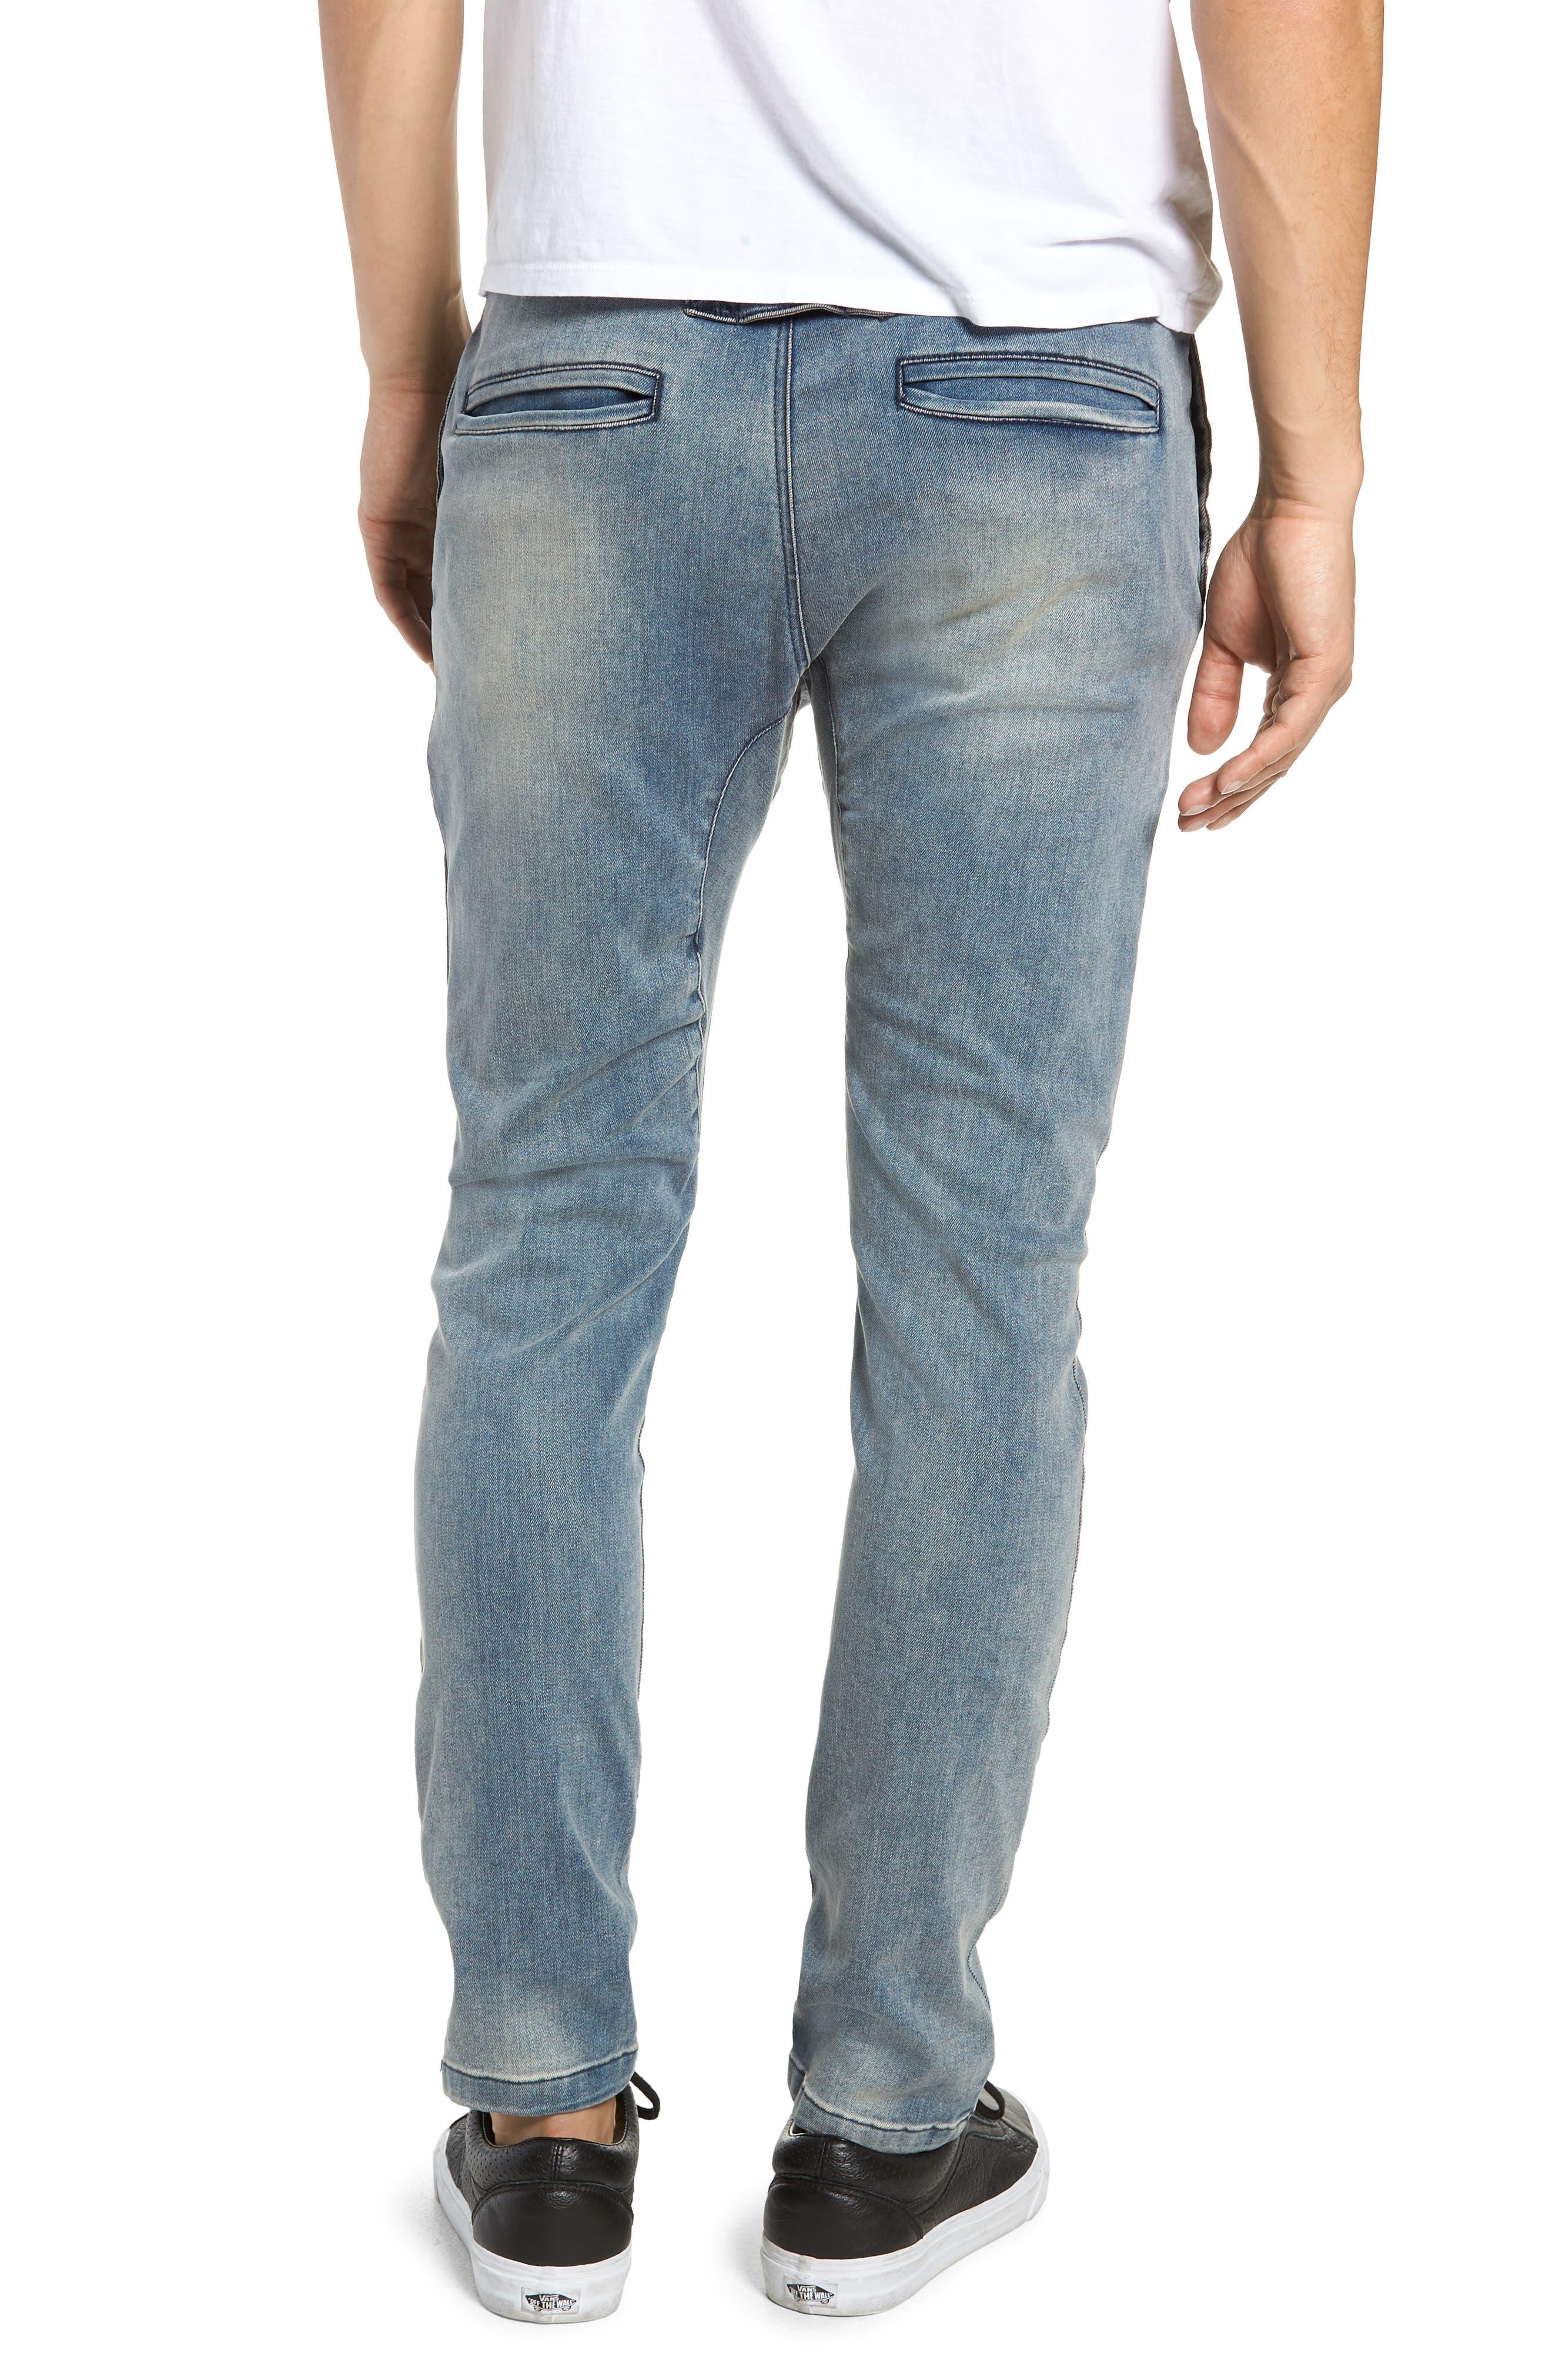 Salerno Flex Jeans,                             Alternate thumbnail 2, color,                             ABANDONED BLUE